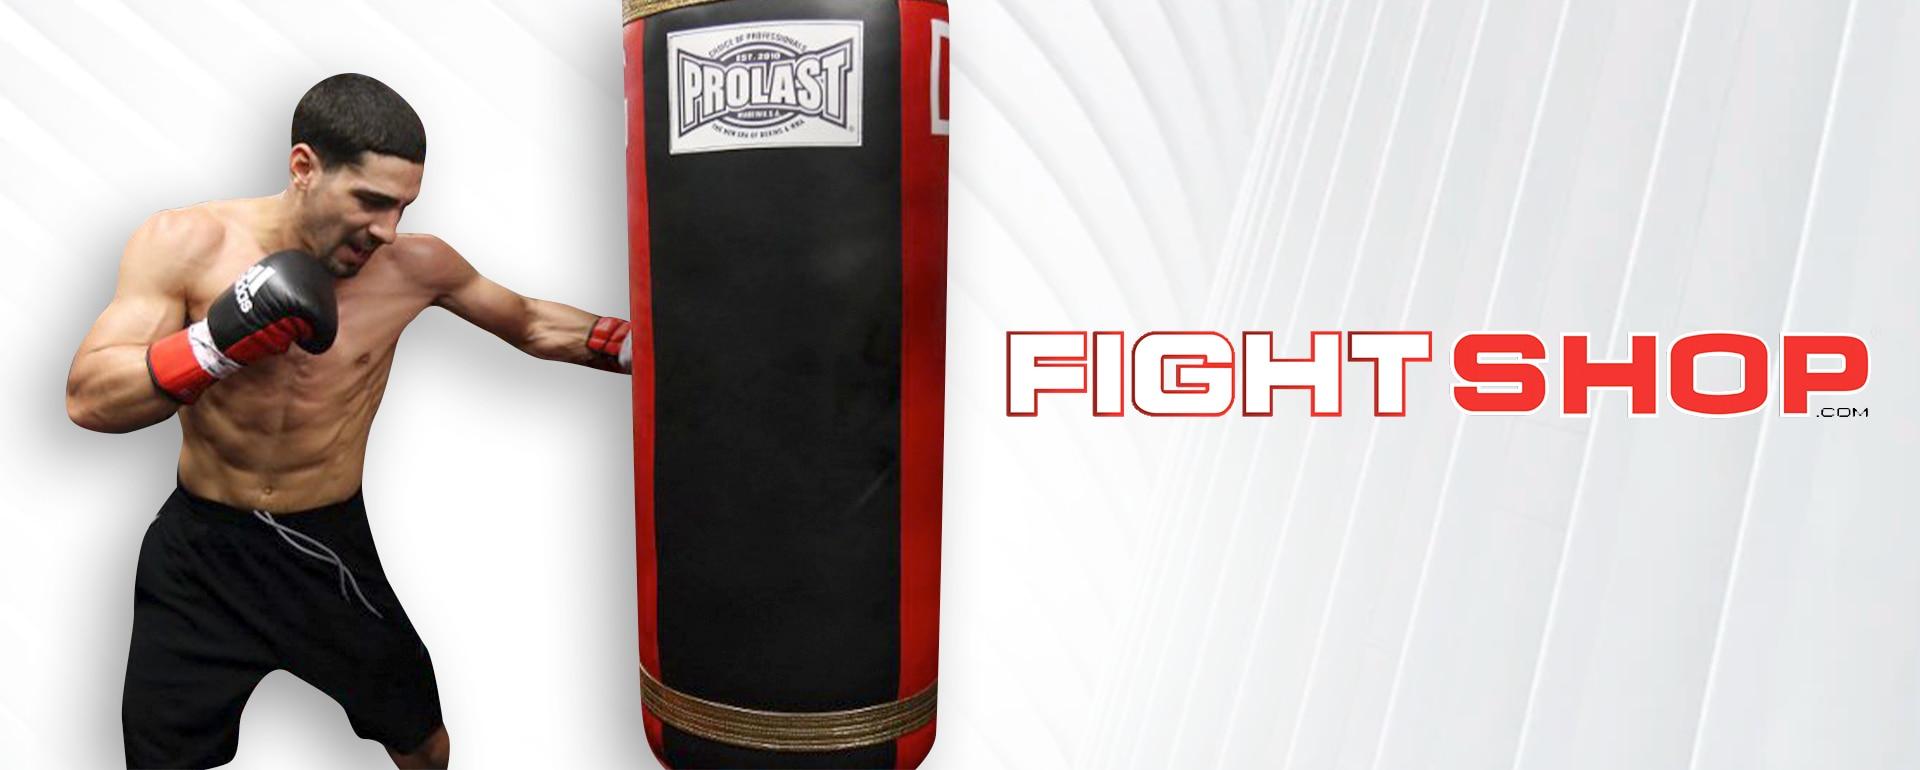 80 LB Platinum Heavy Bag Kit Boxing Punching Kicking Gloves Hand Wraps Silver